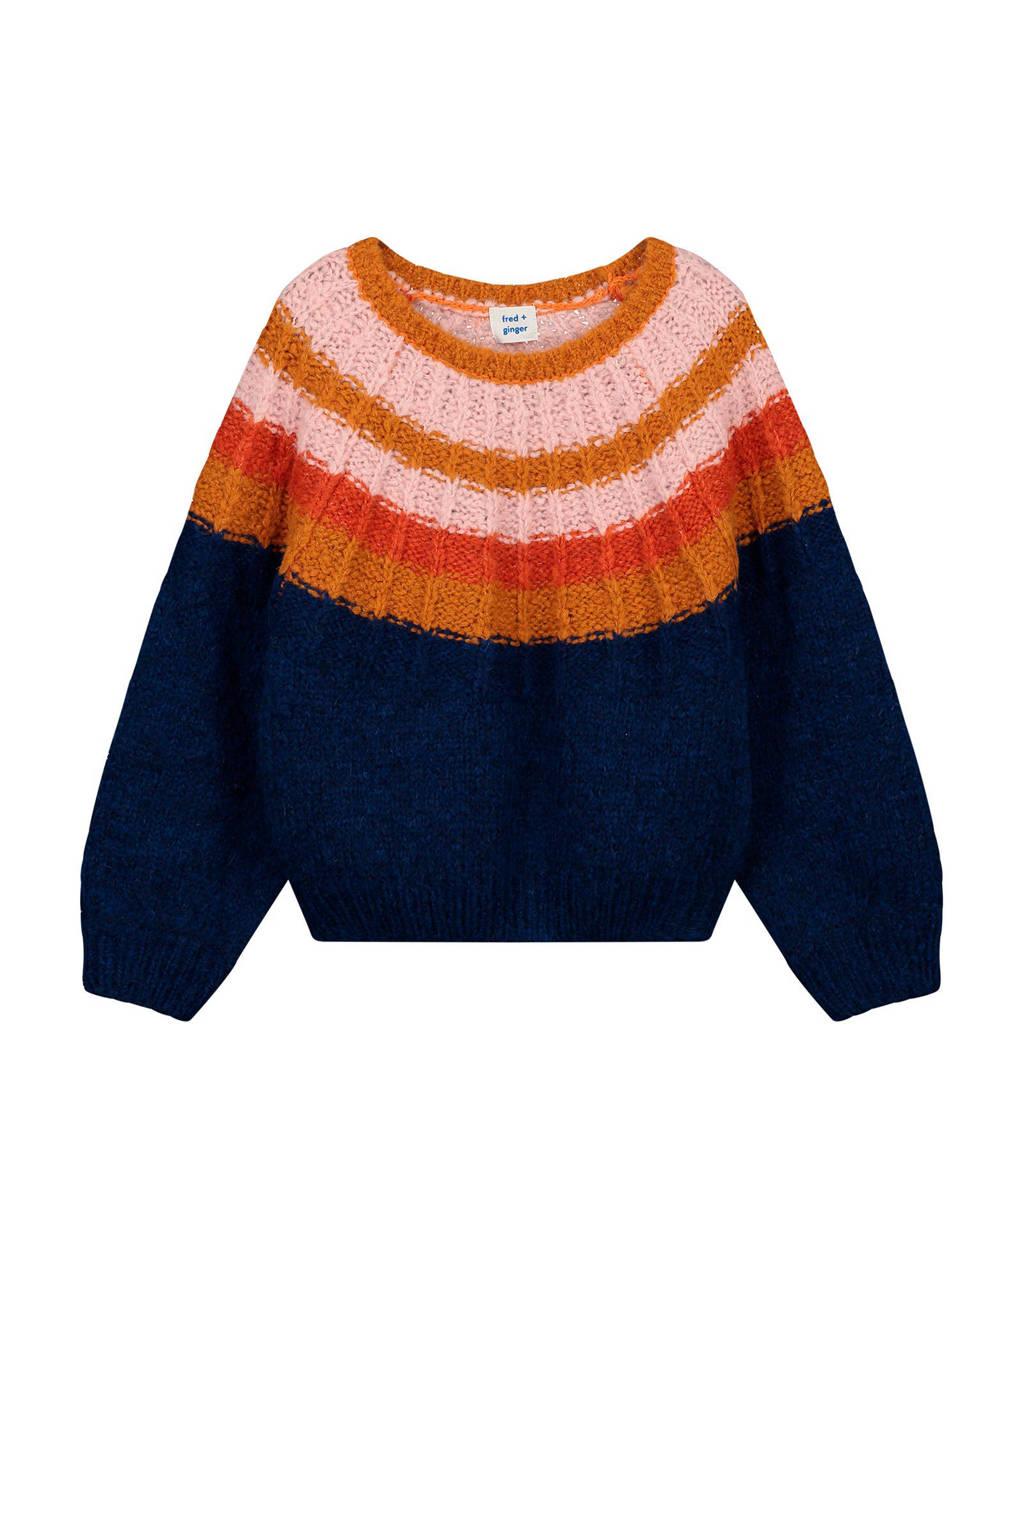 fred + ginger grofgebreide trui Xin met wol donkerblauw/multi, Donkerblauw/multi